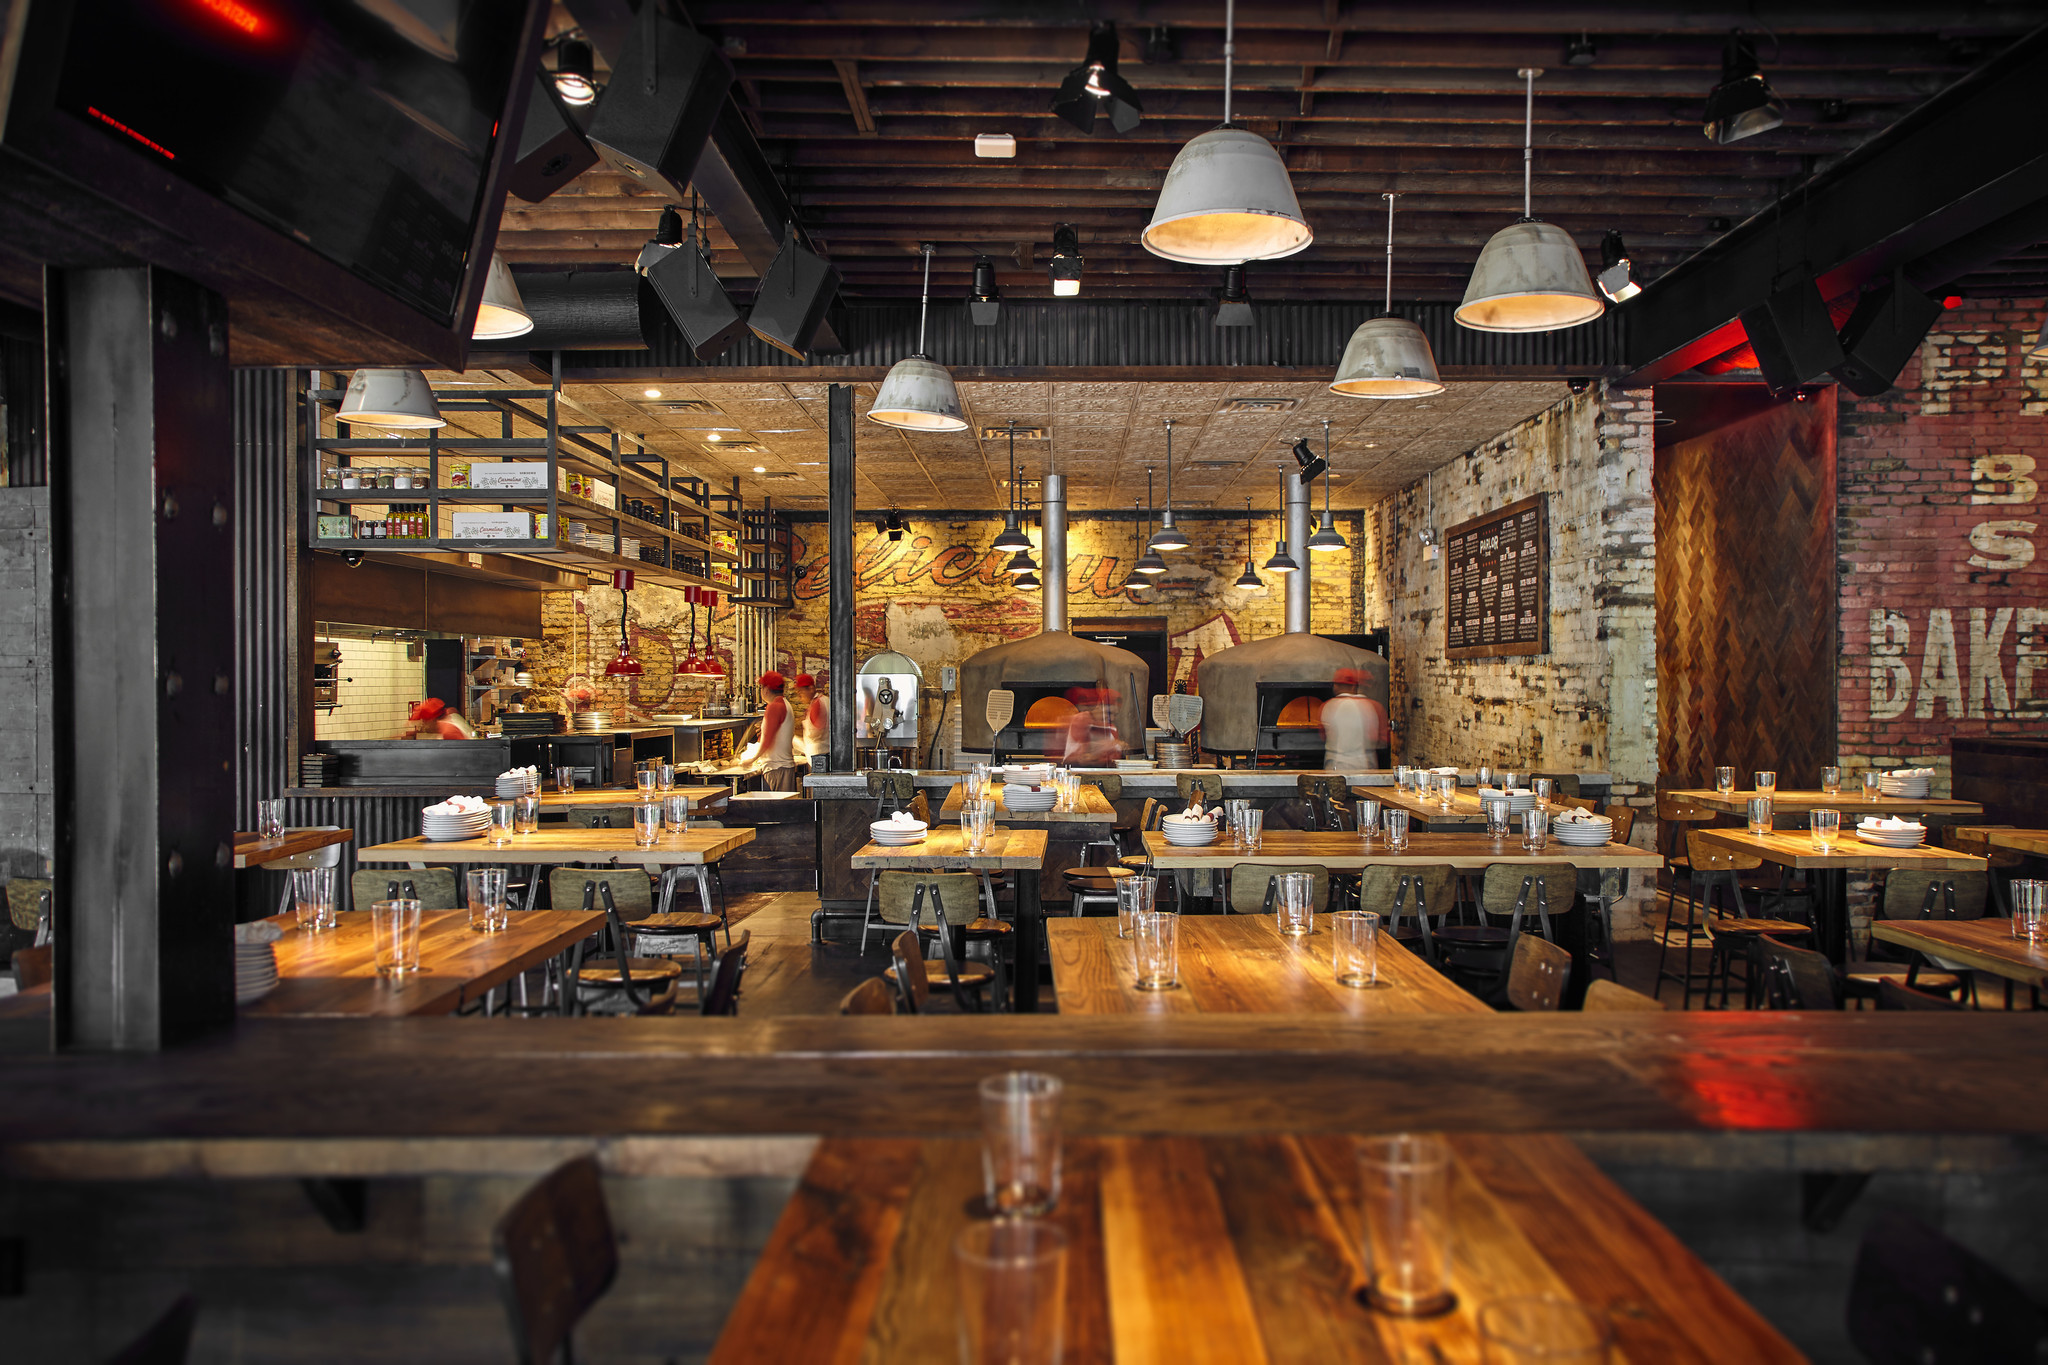 Bar deals chicago wednesday